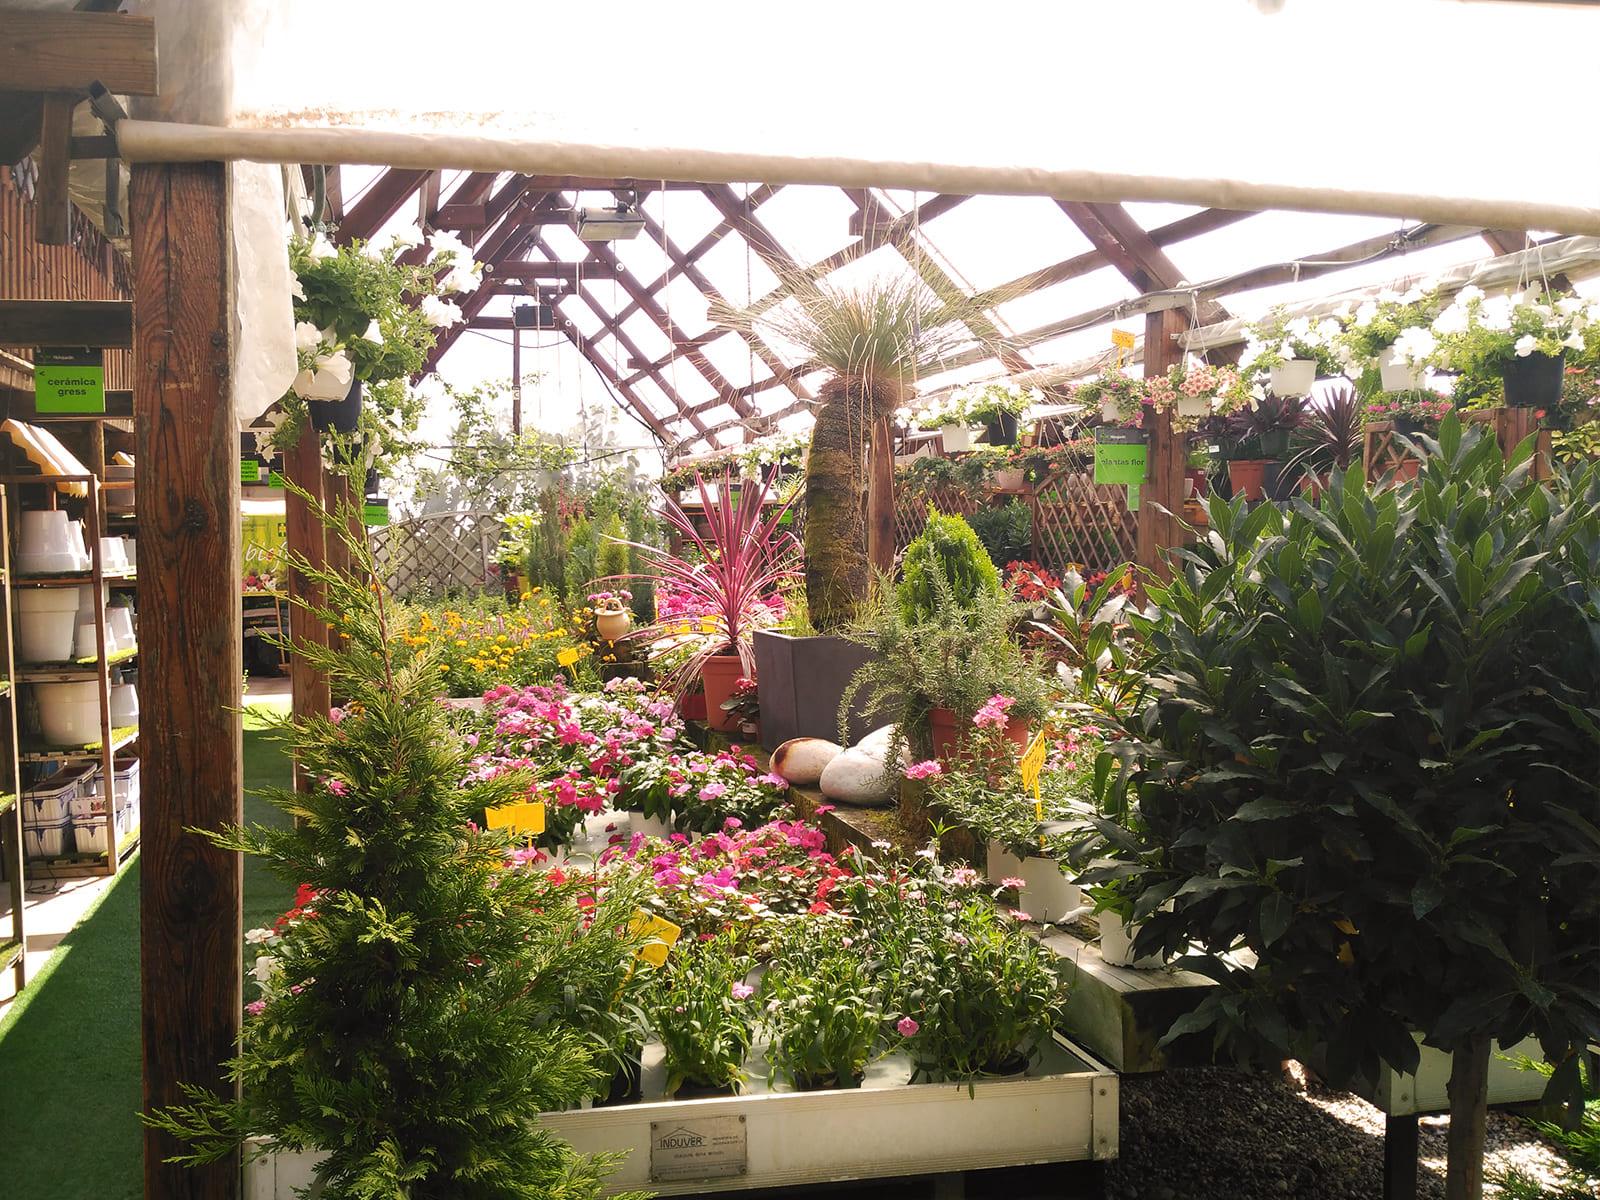 centro-jardineria-garden-invernadero-artesanal-madera-fuente-17_HIDROJARDIN-Bañeres